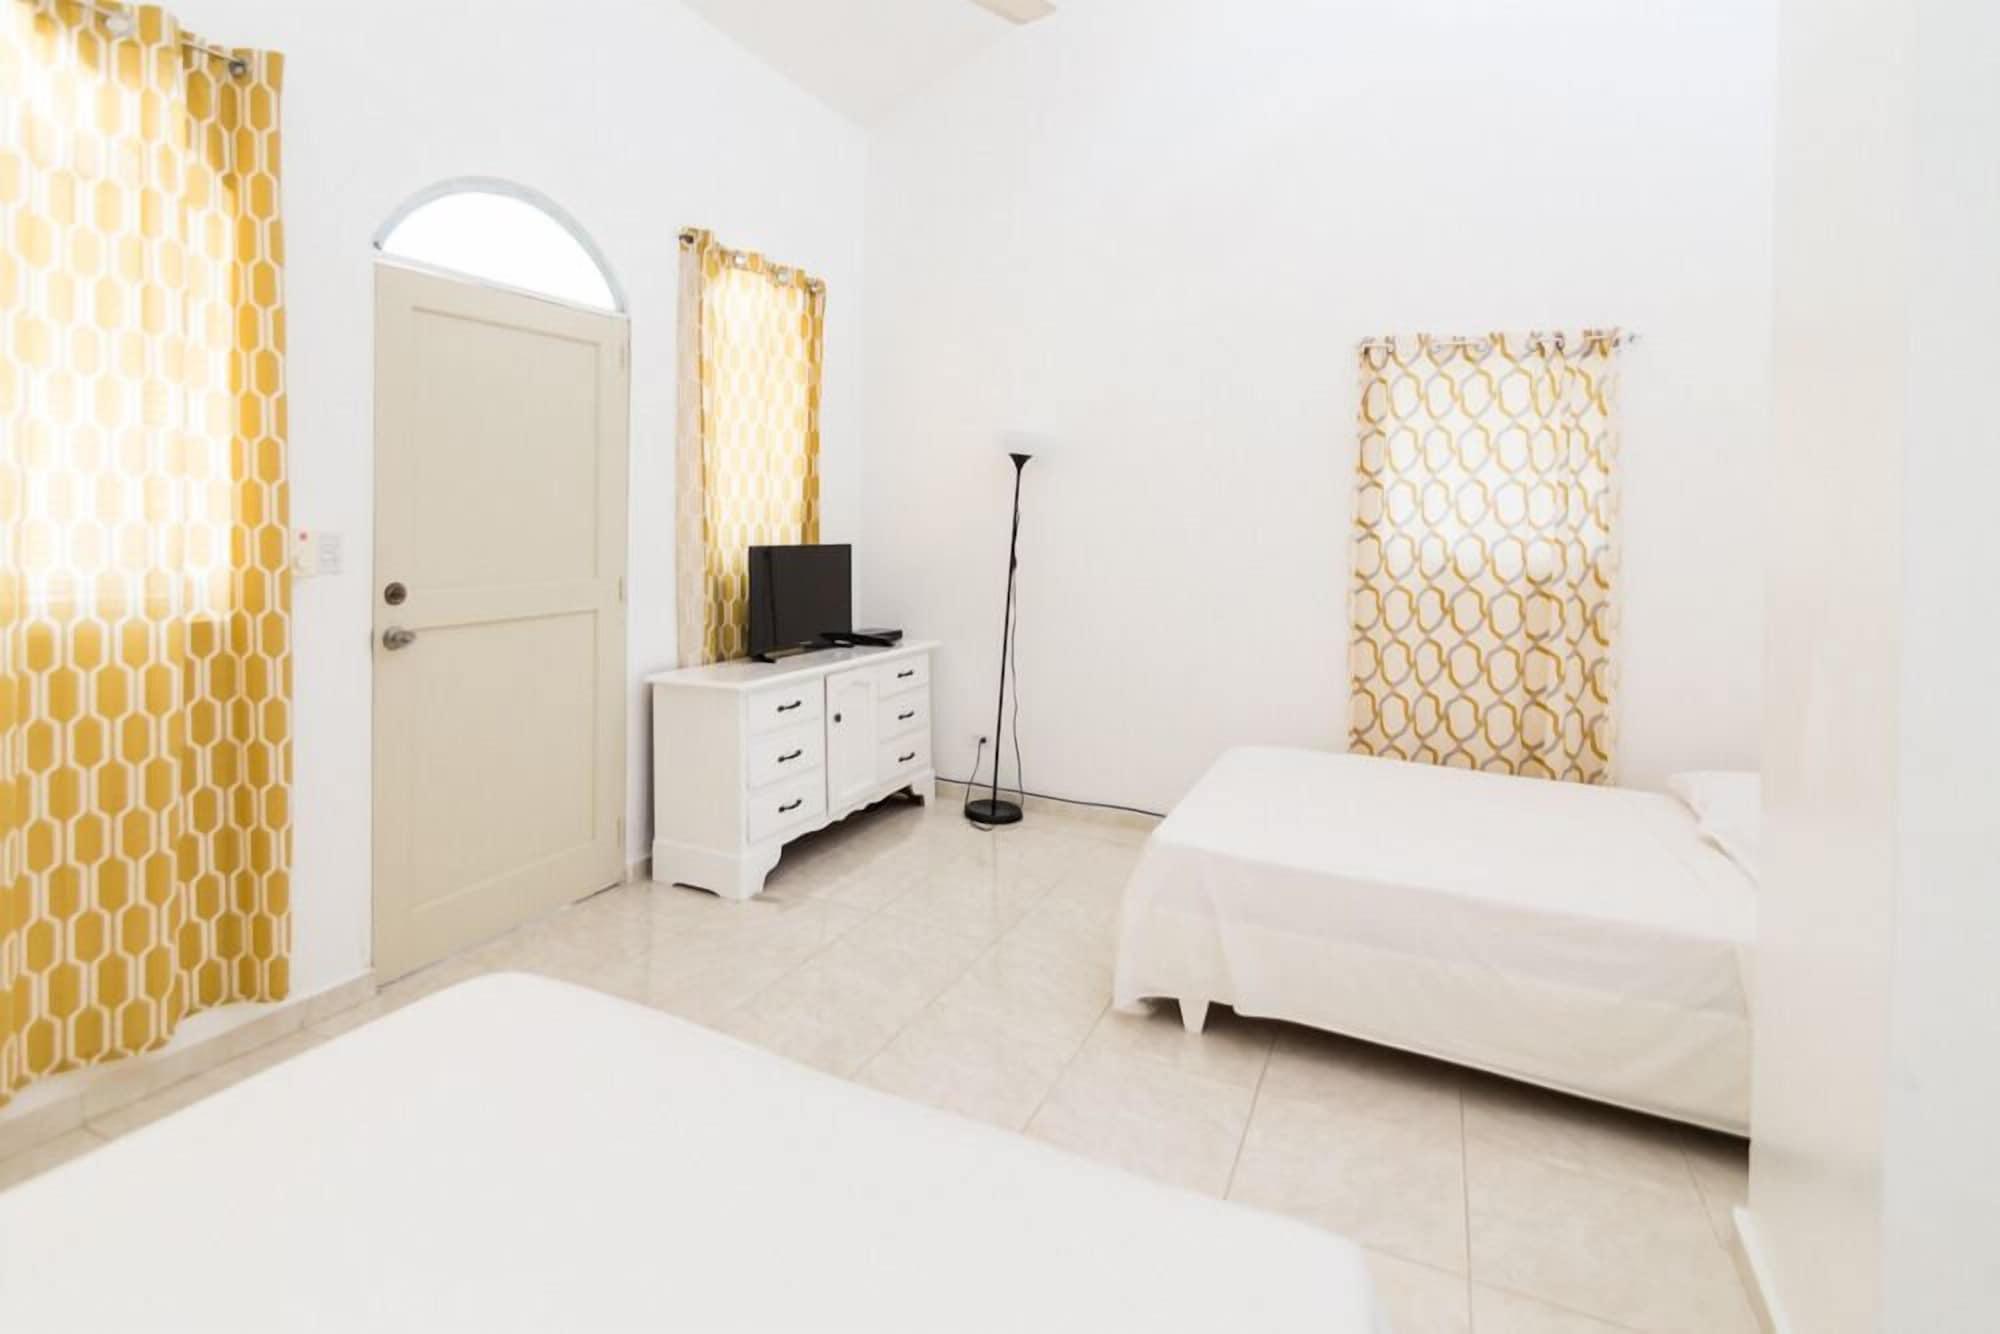 Northway's Hotel Monte Cristo, Sosua